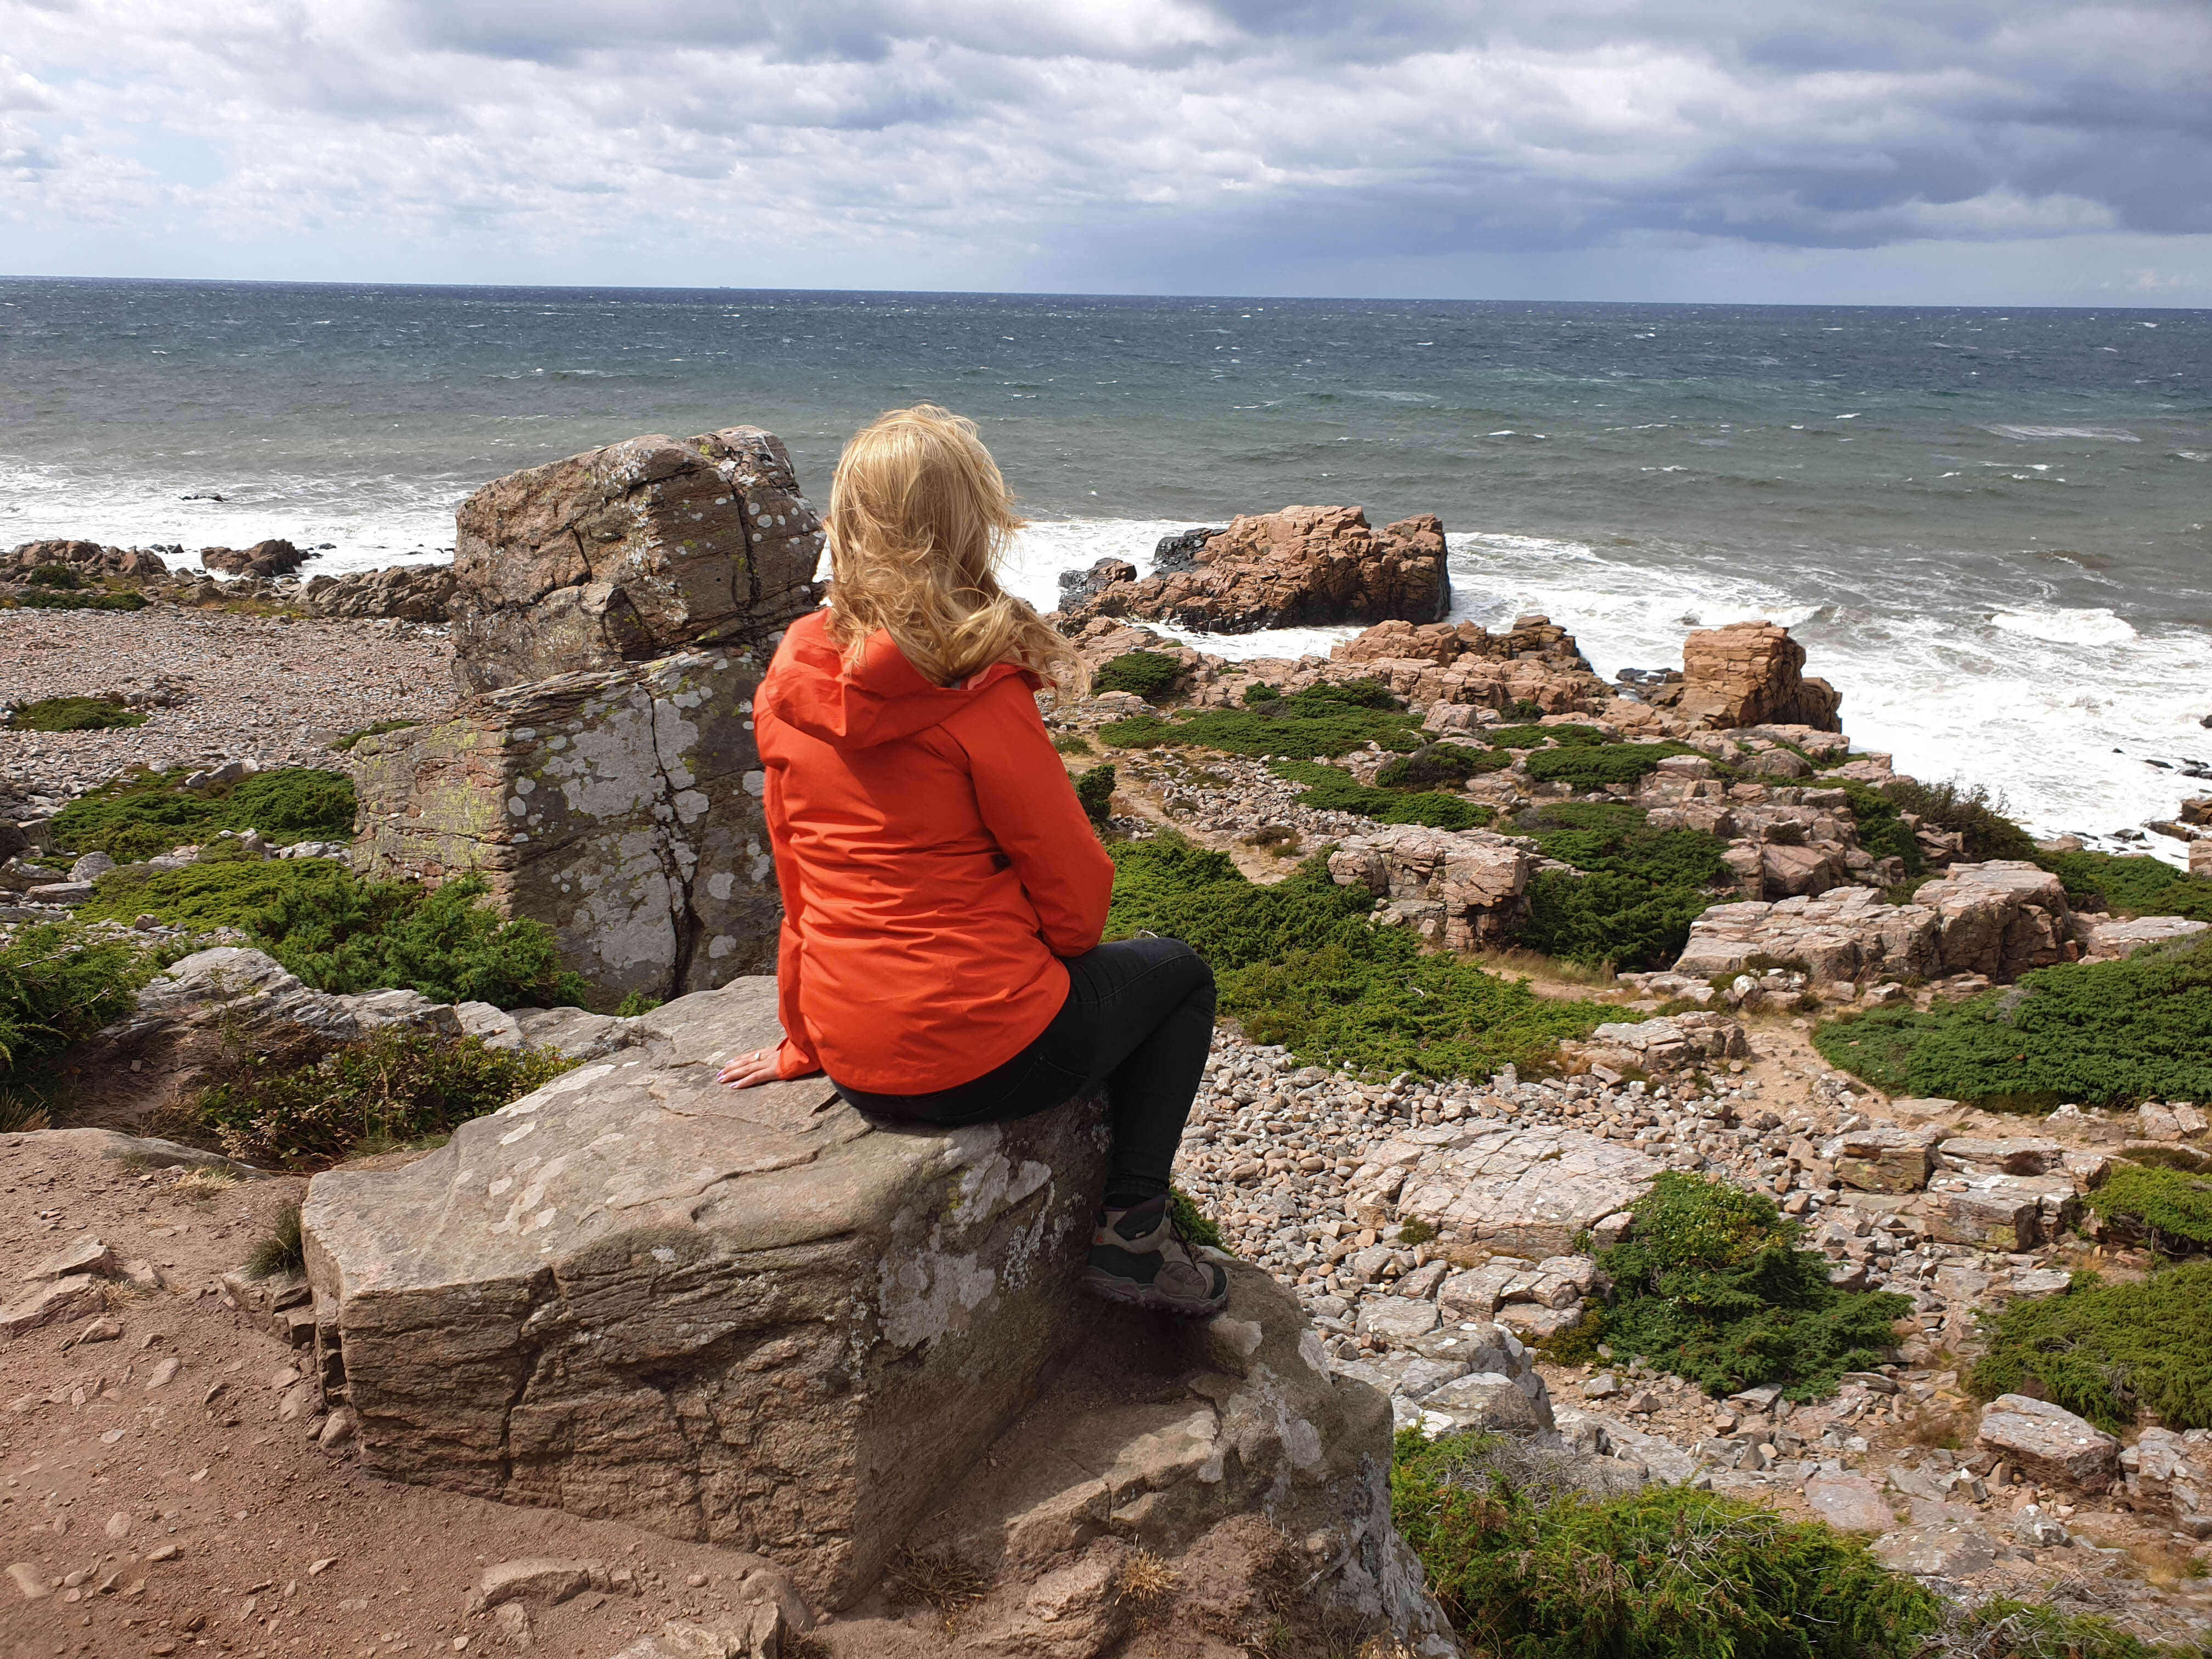 Mooiste nationale parken in Zuid Zweden, Skåne